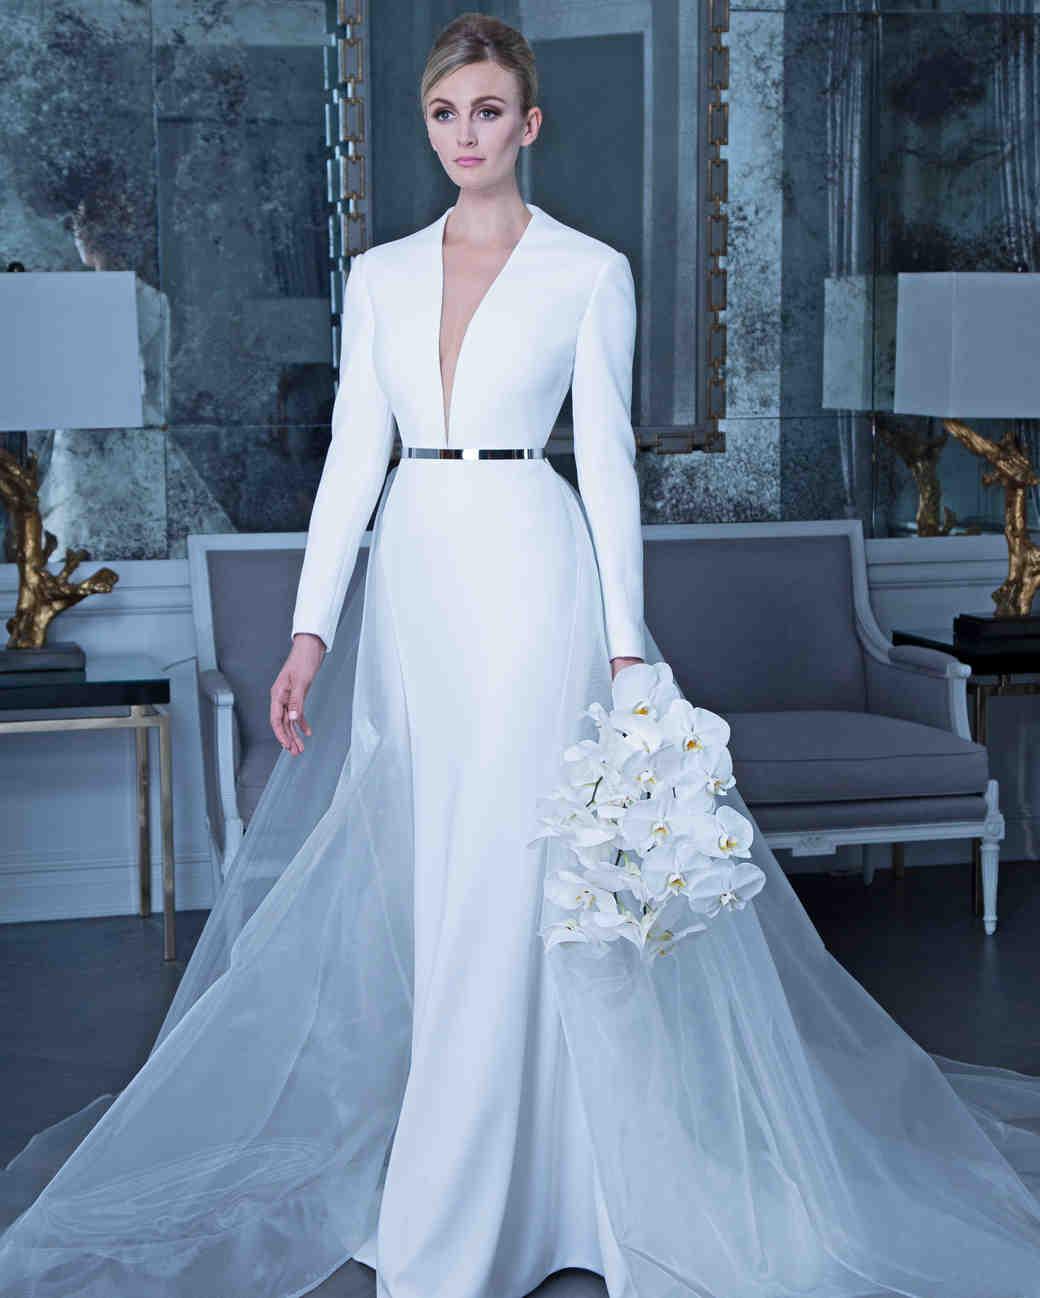 Long Sleeve Form Fitting Wedding Dresses